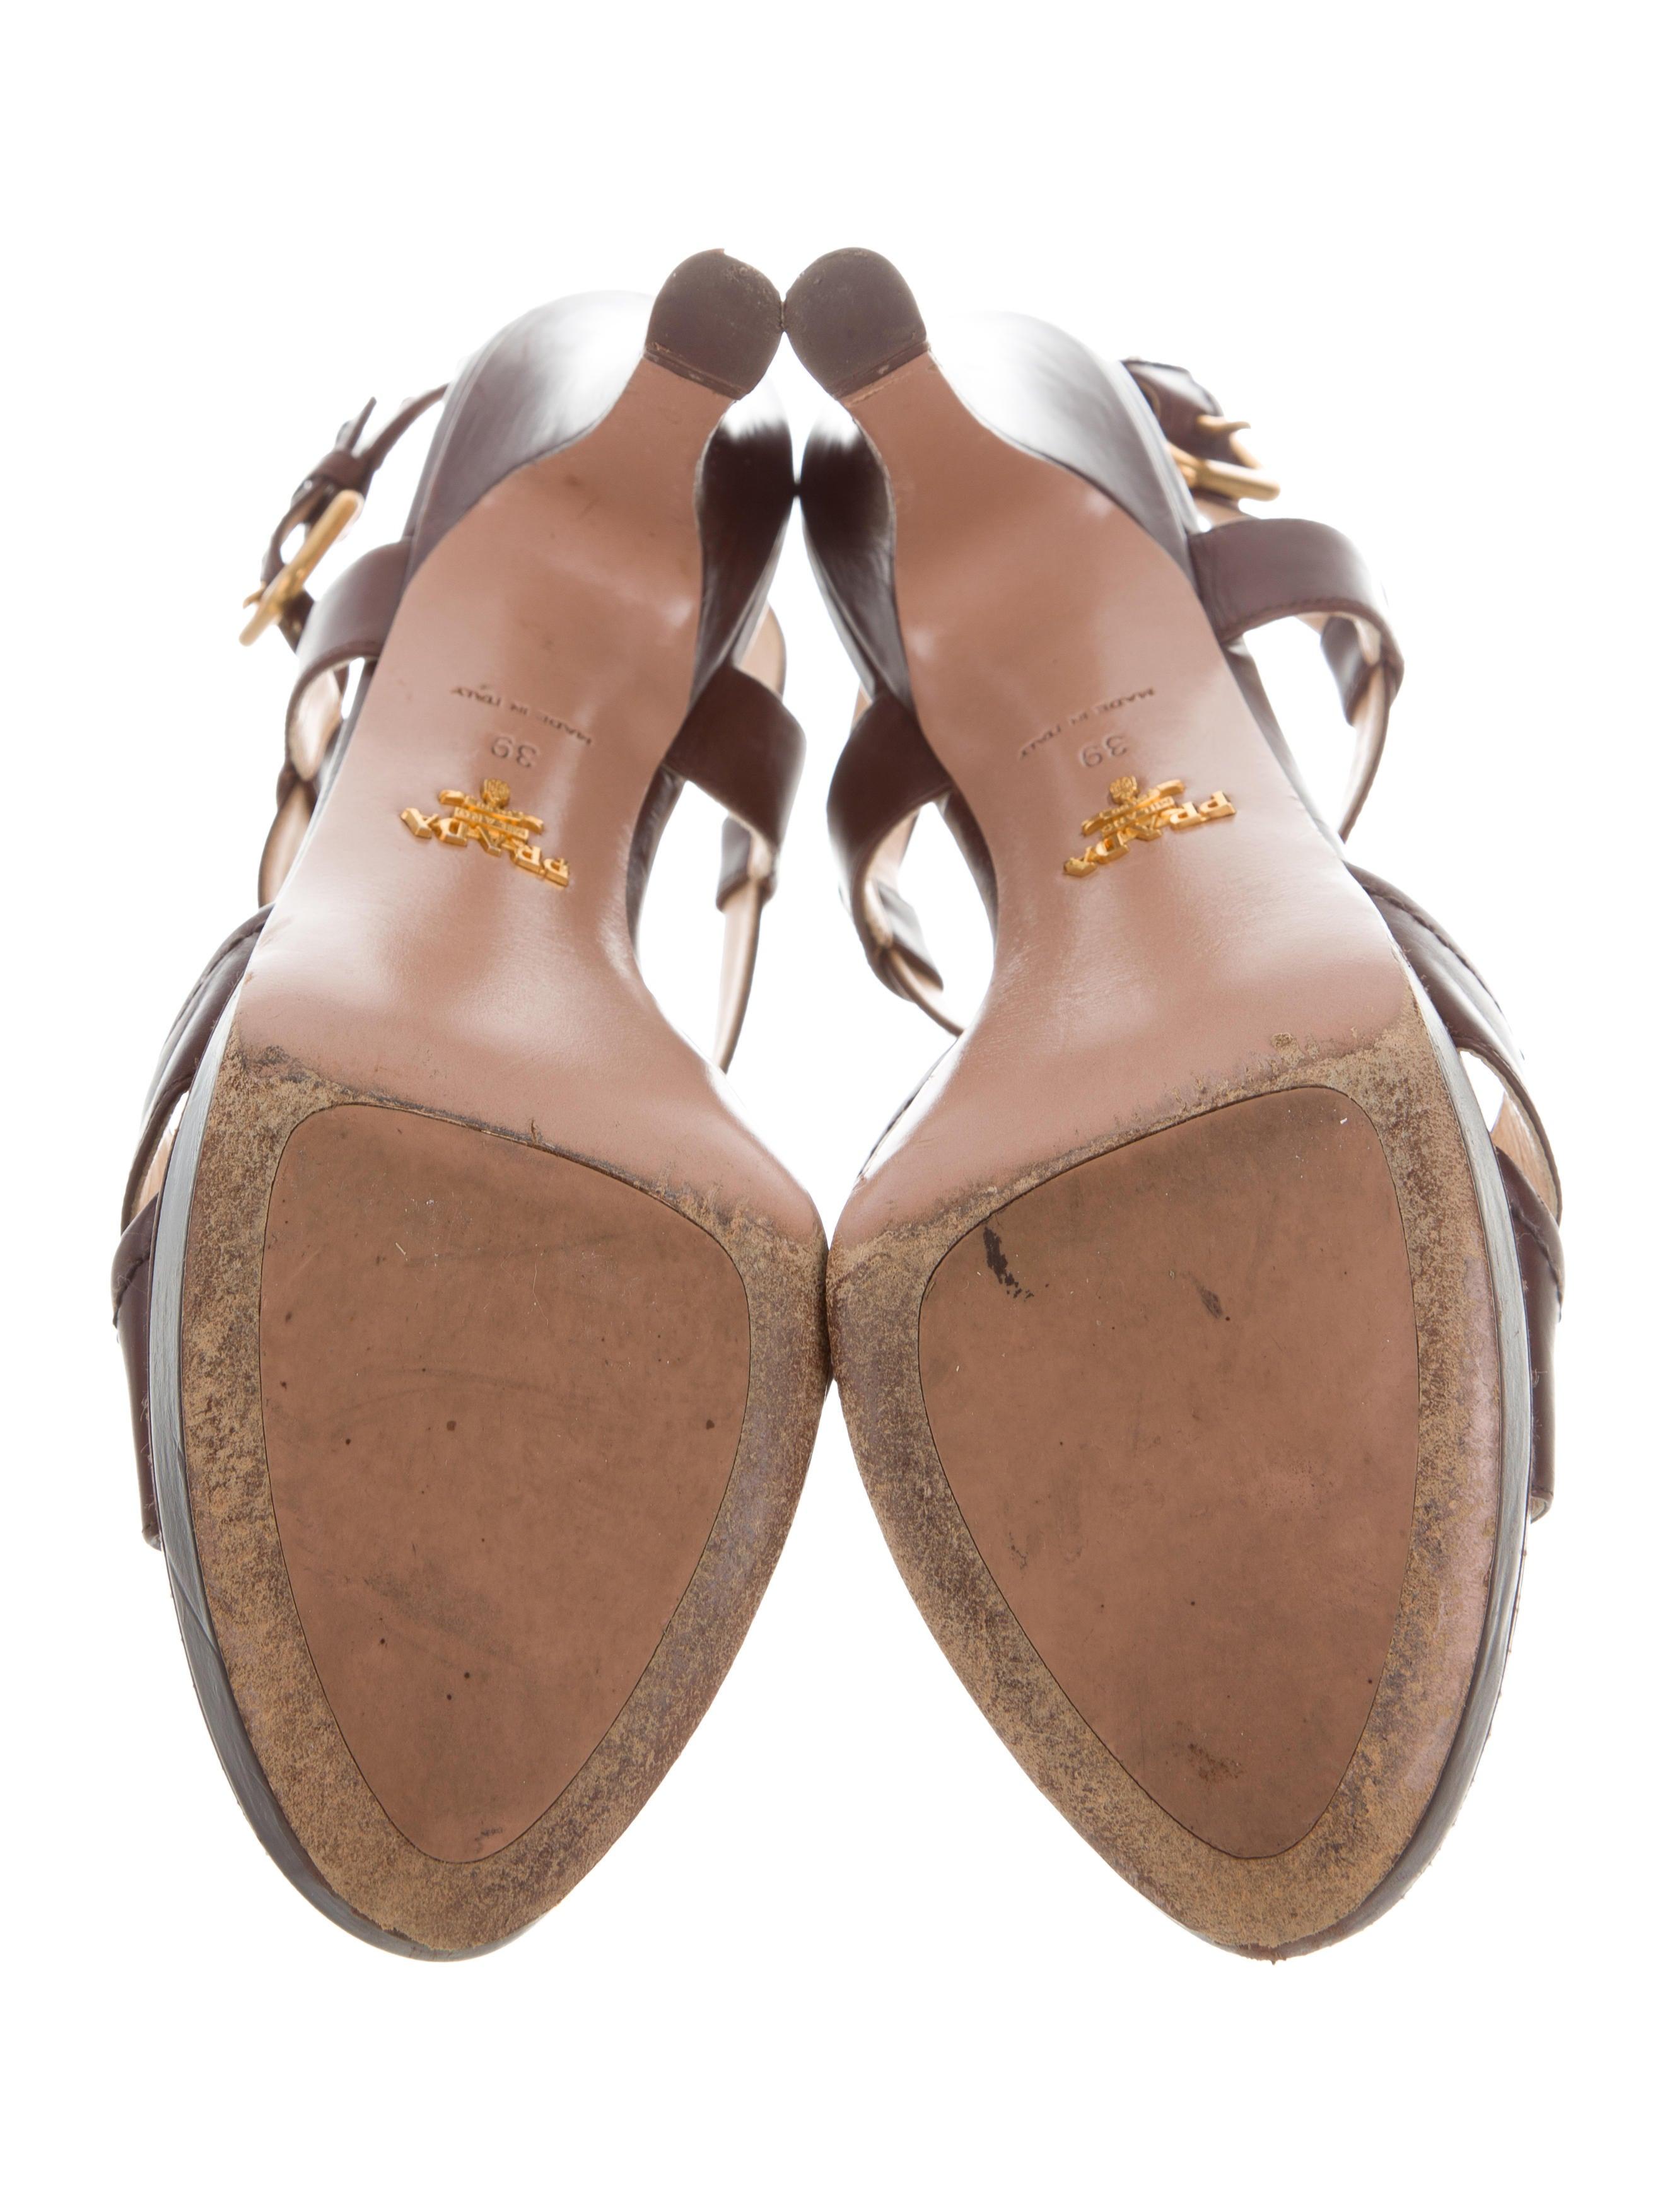 prada t platform sandals shoes pra170380 the